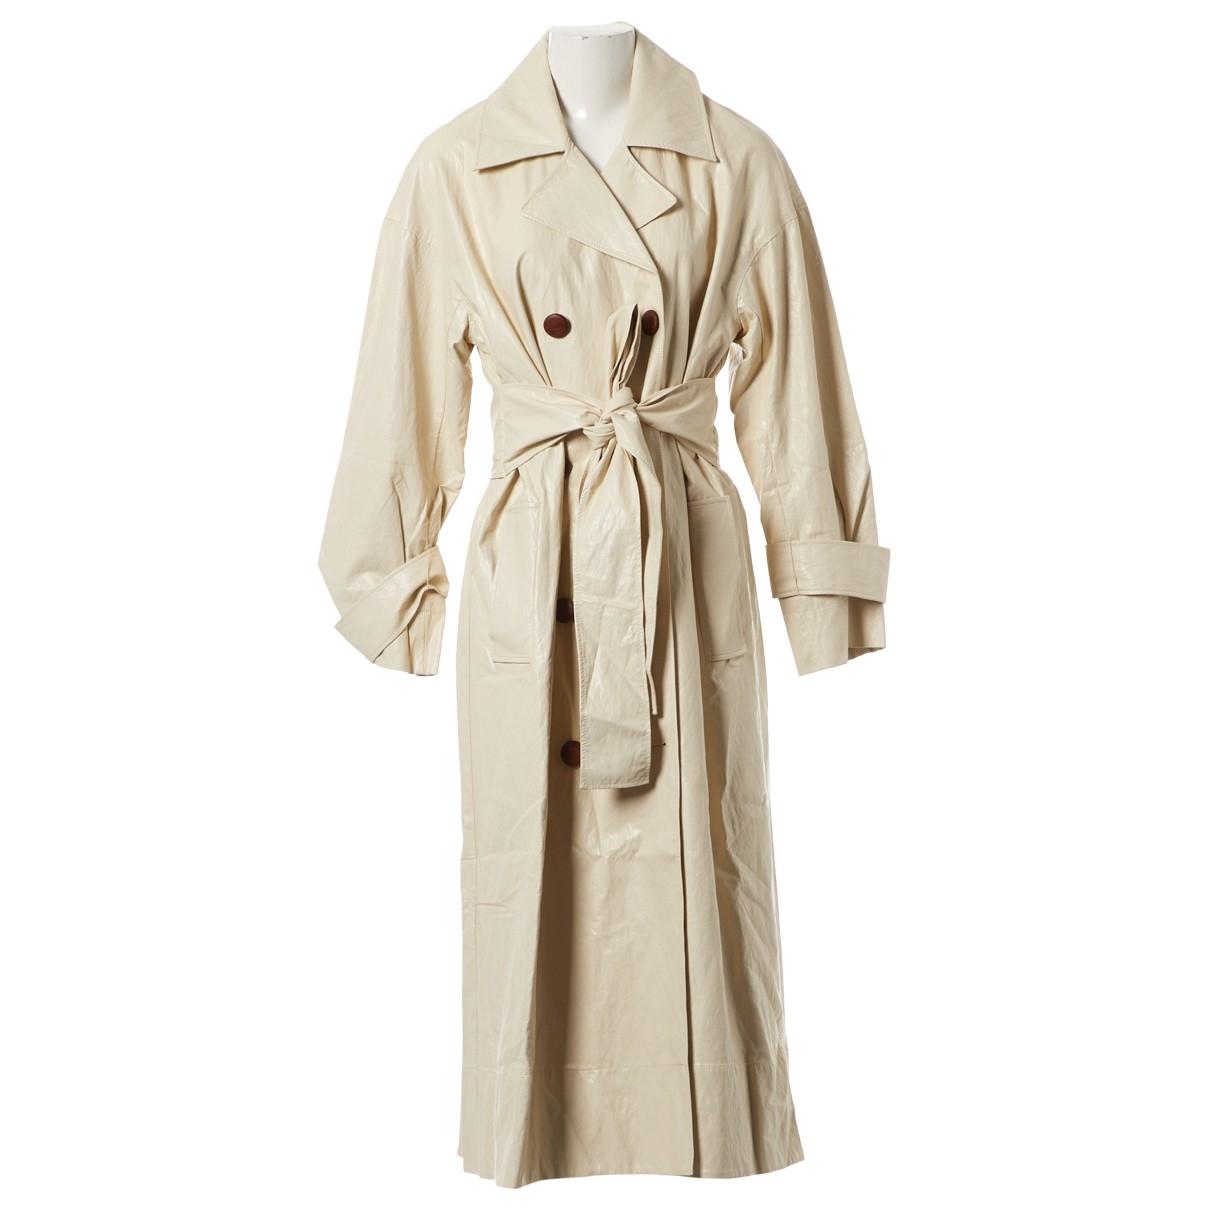 Rejina Pyo X Vestiaire Collective \N Ecru Leather Trench coat for Women L International